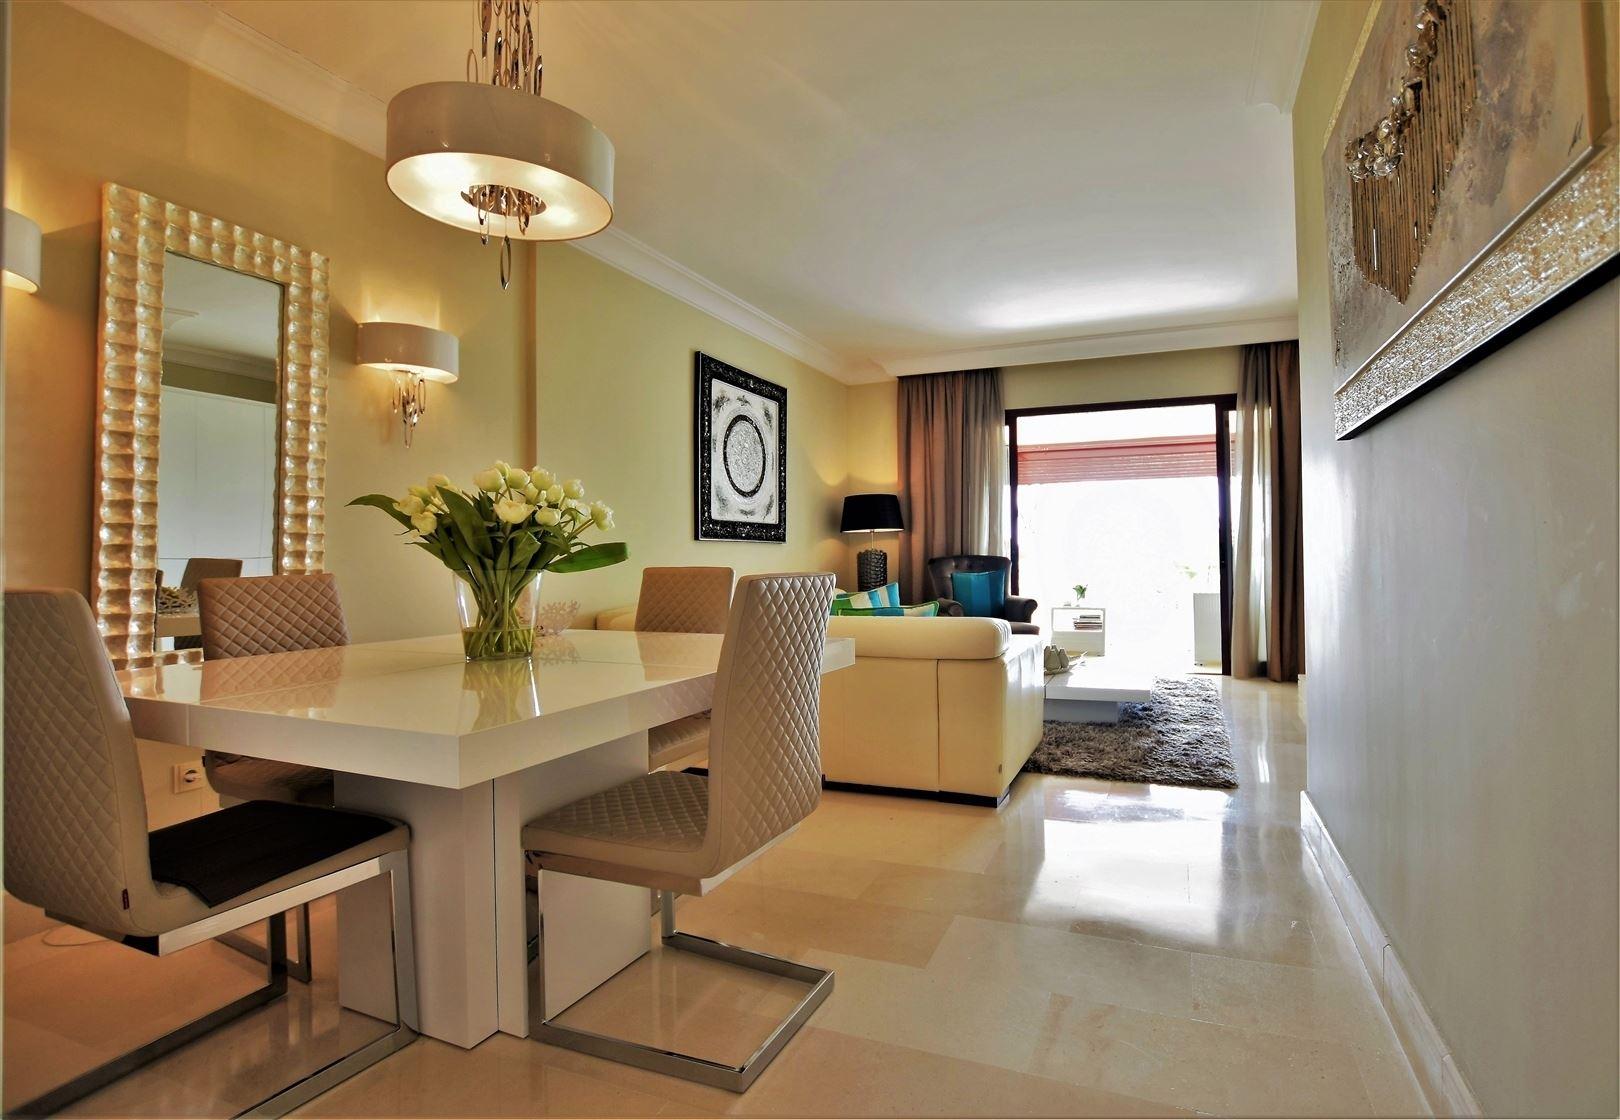 Foto 6 : Appartement te 29679 MARBELLA (Spanje) - Prijs € 1.750